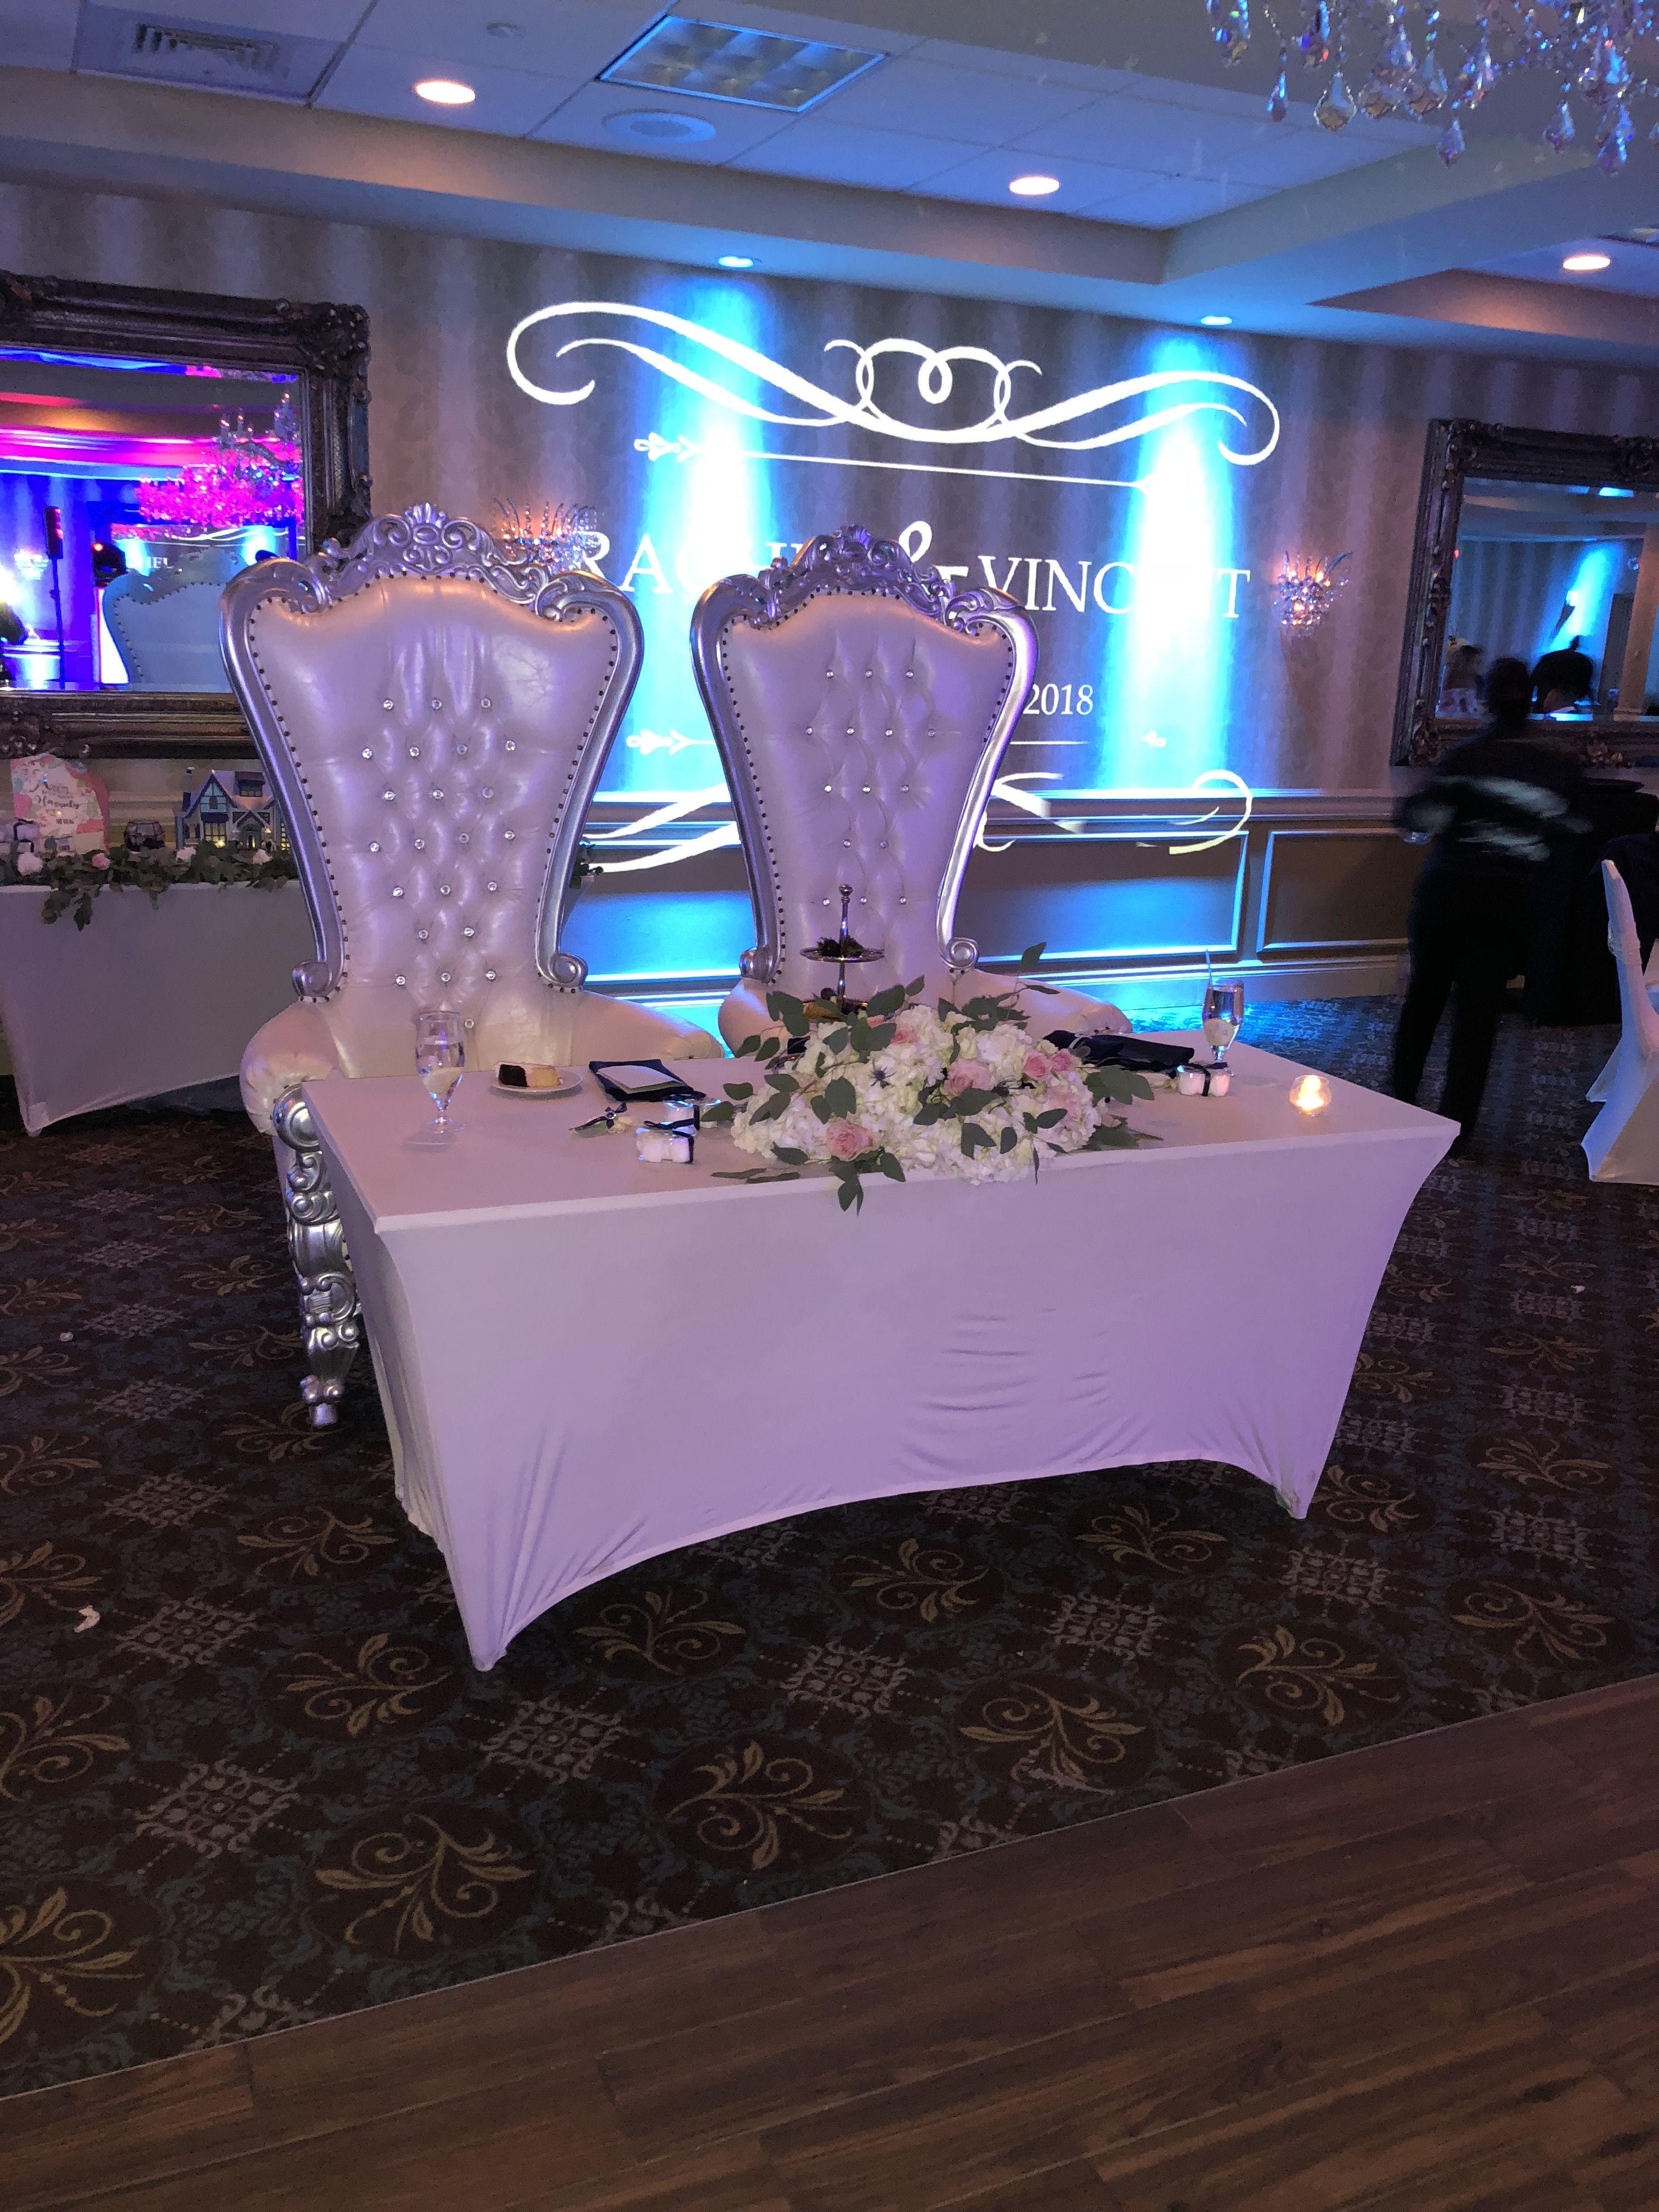 Custom Bride Groom Chair Rentals Ask Us Alankeithentertainment Brideandgroomchair Bride Groom Chairs Wedding Dj Bride Groom